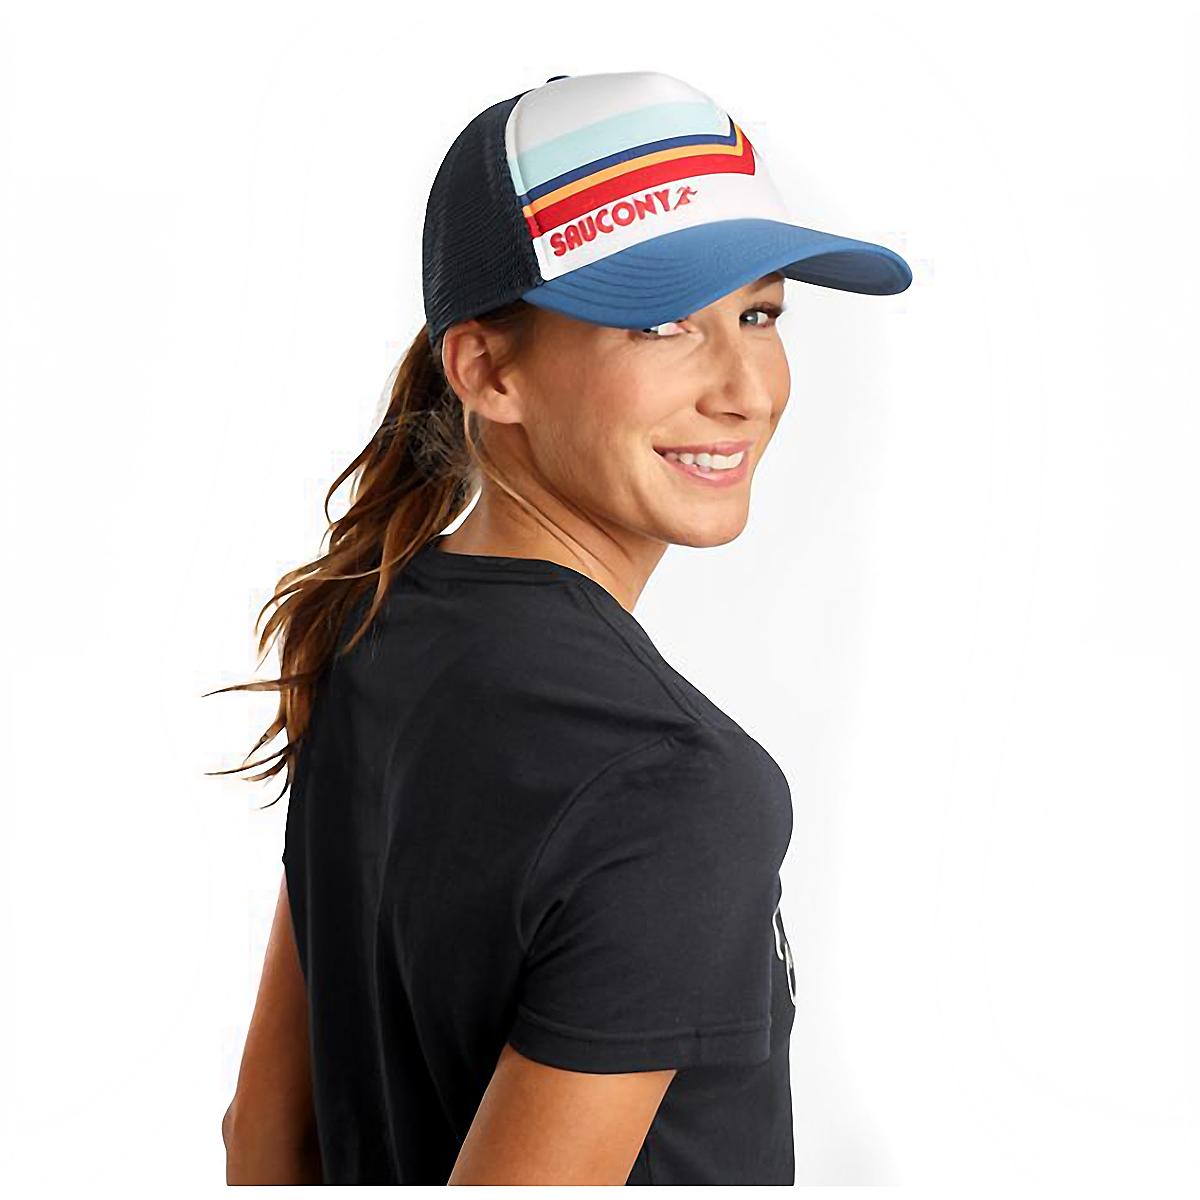 Saucony Foam Trucker Hat - Color: White, White, large, image 1